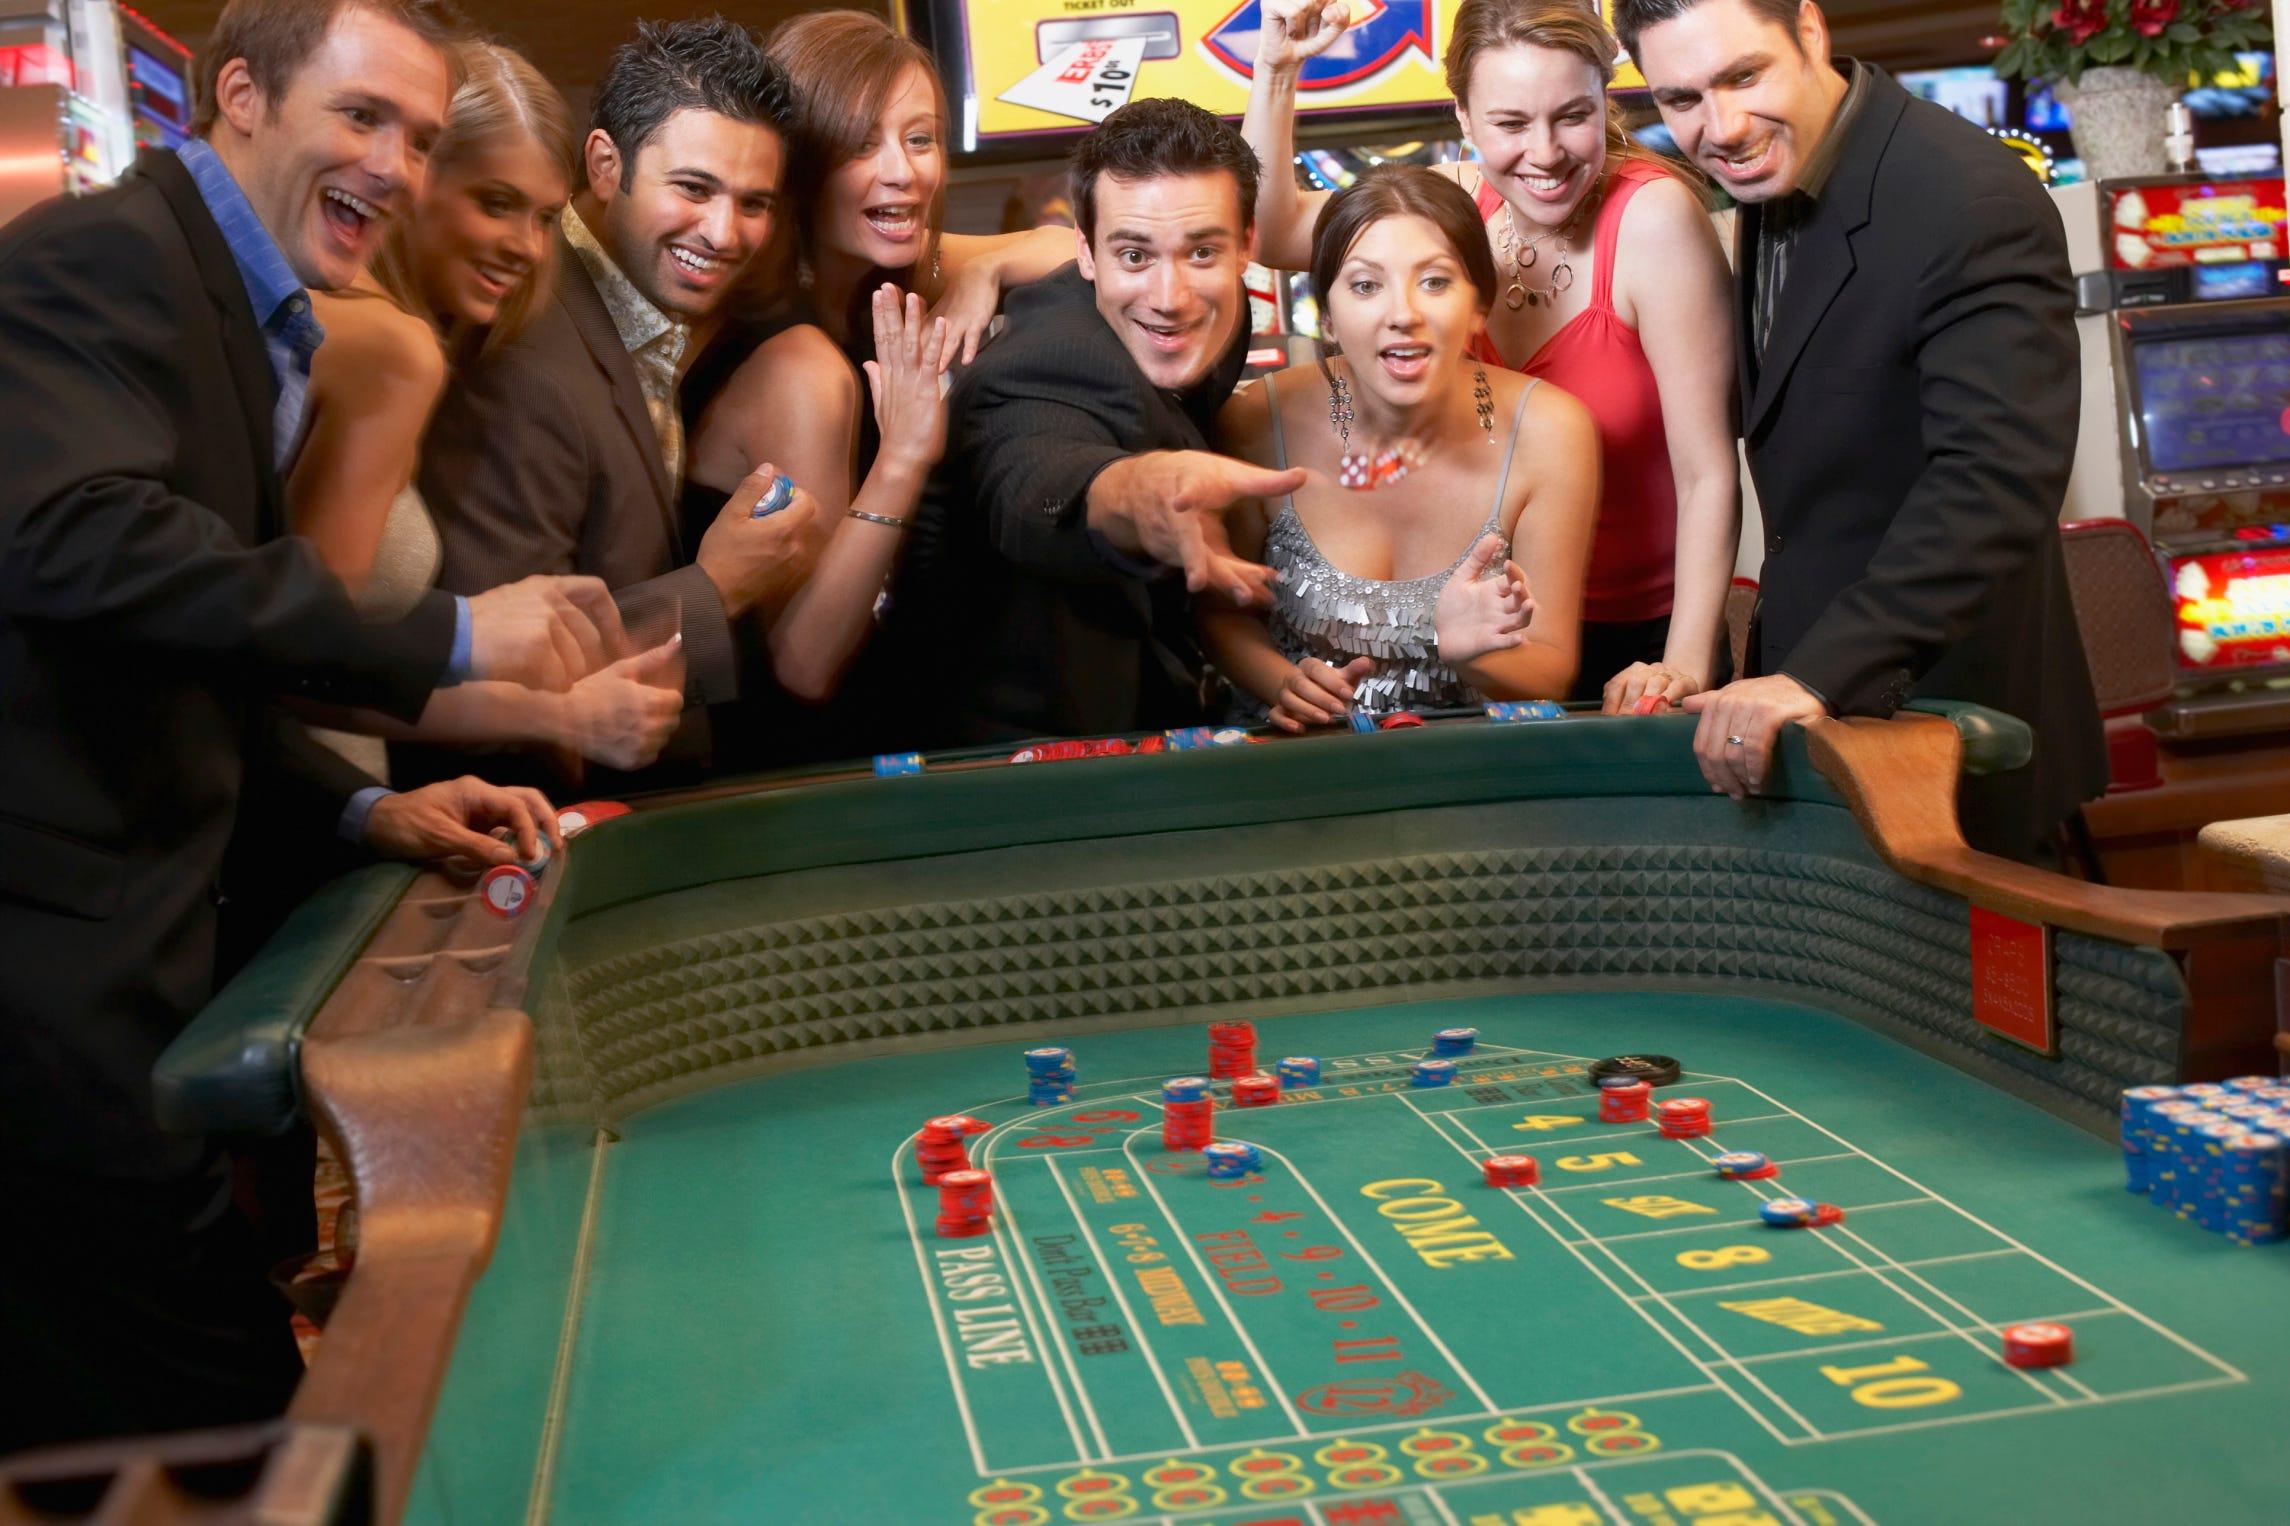 Casino awards wrong man